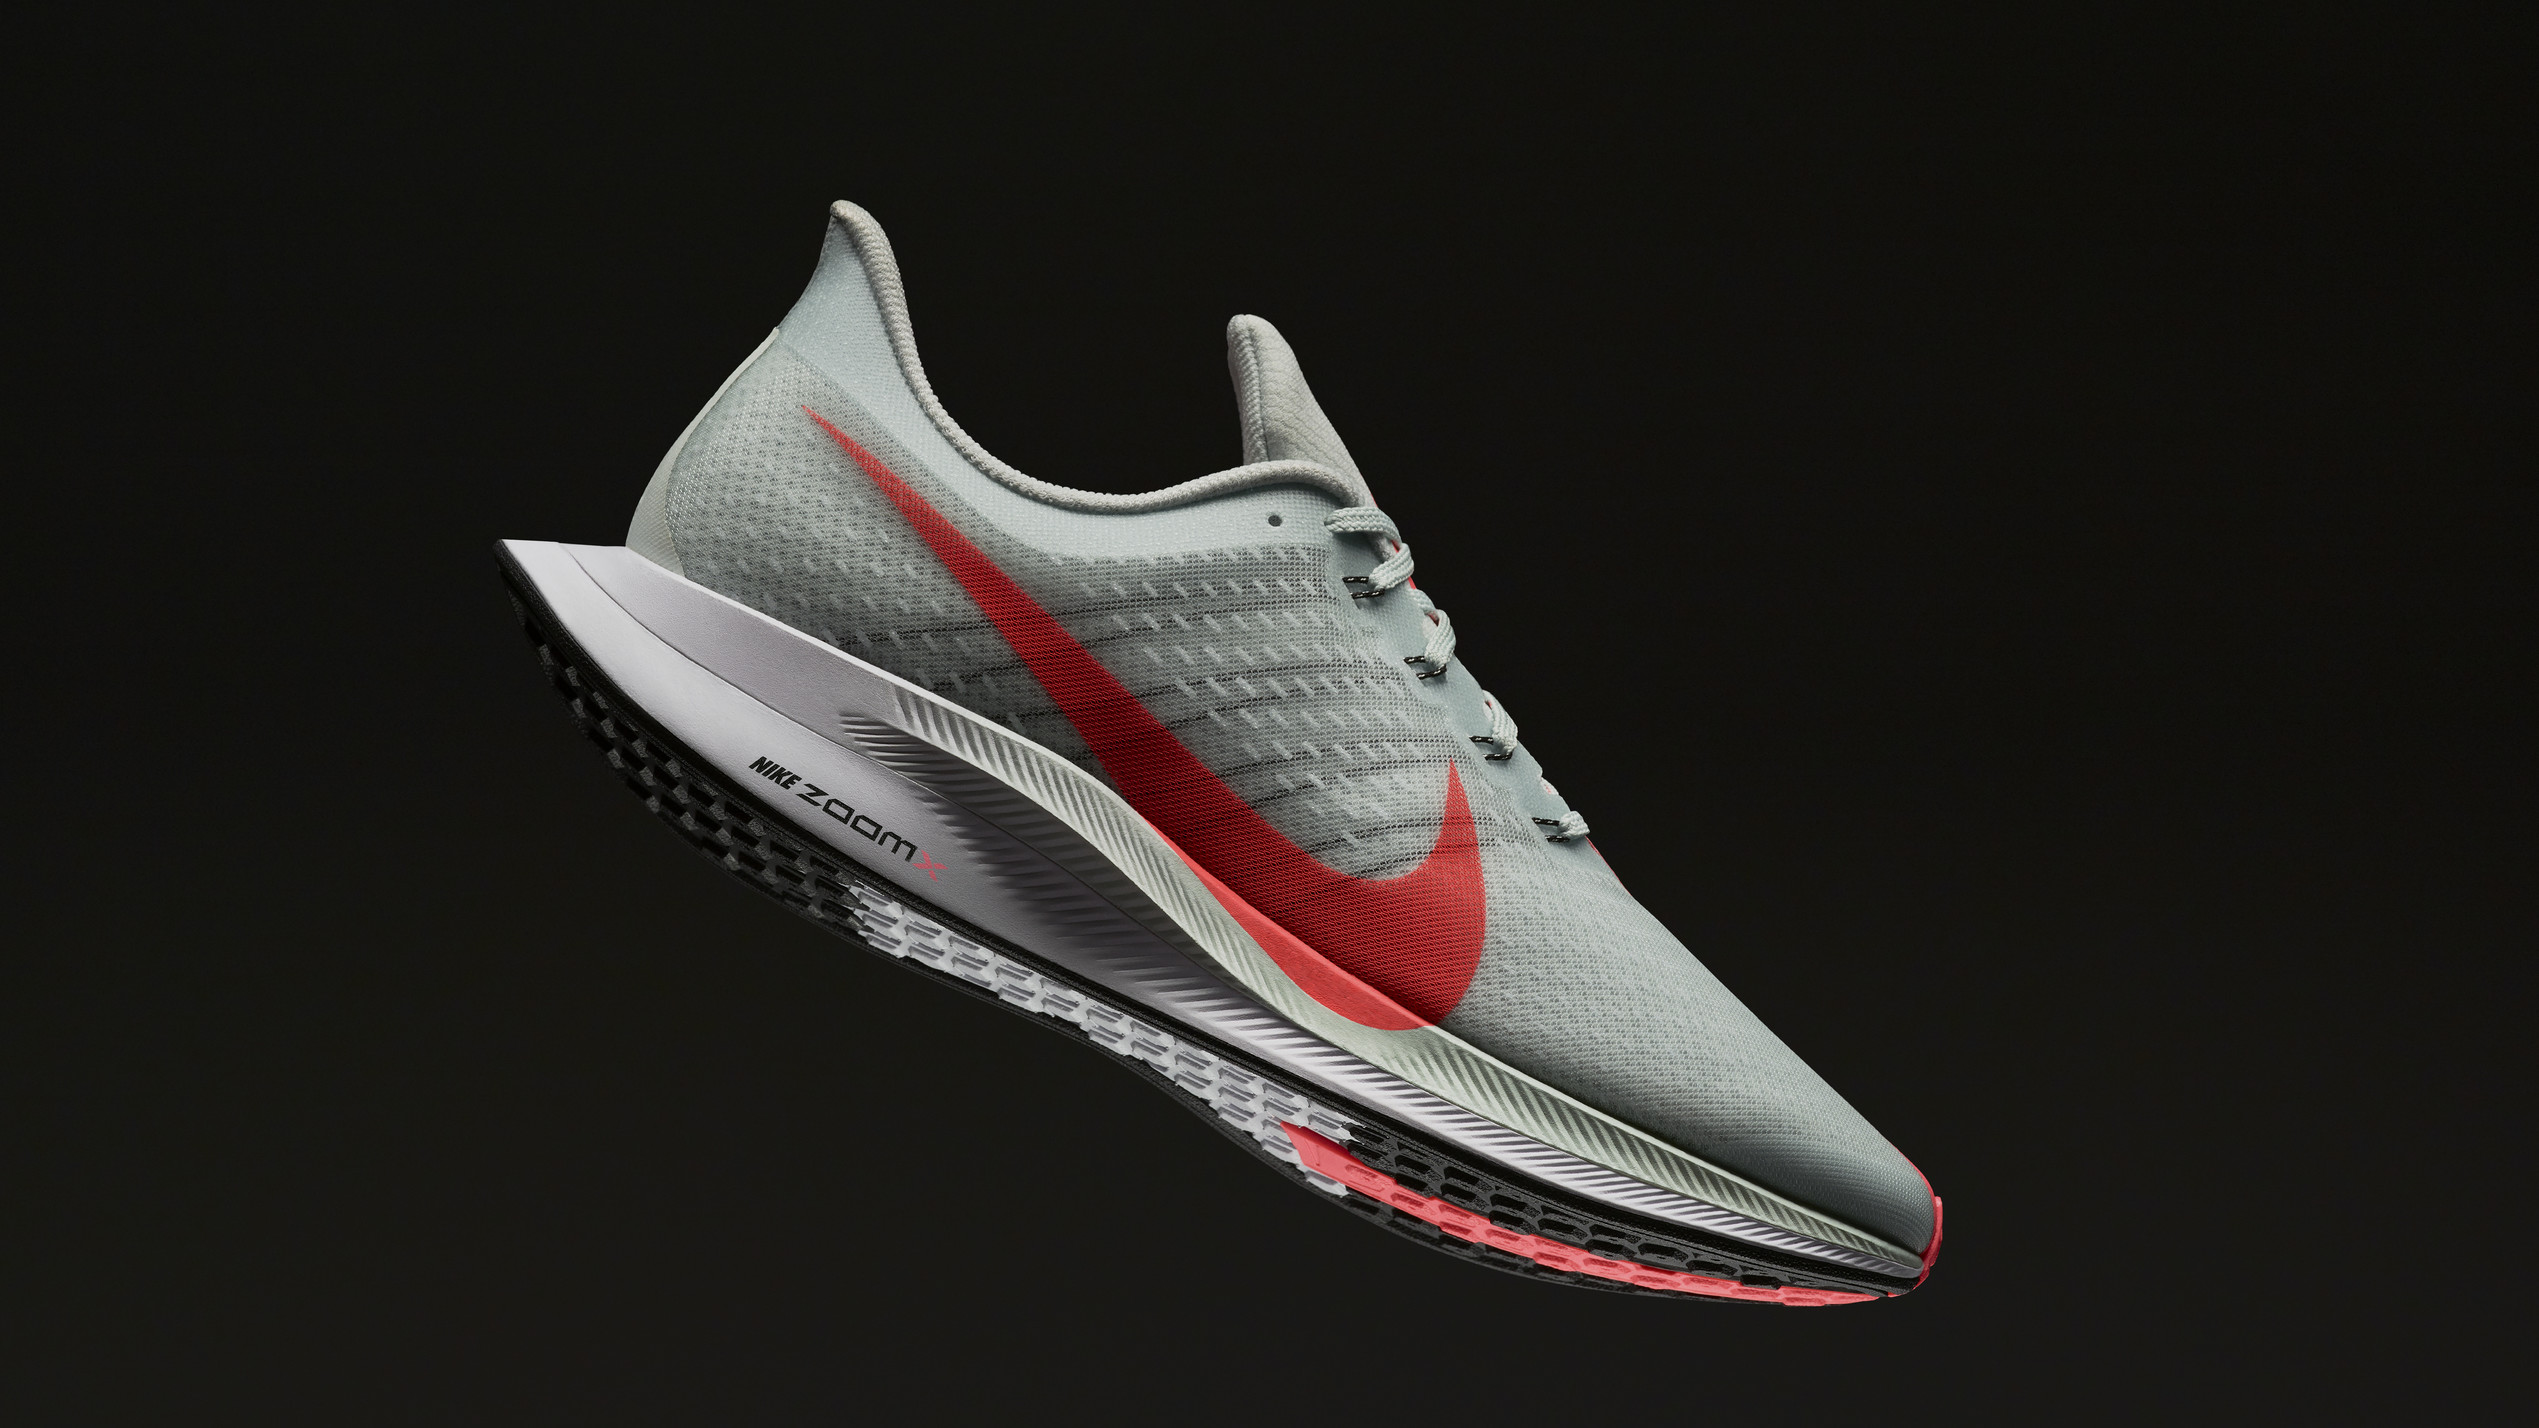 sale retailer b2d6c cdc4b Nike Zoom Pegasus Turbo Release Date   Sole Collector